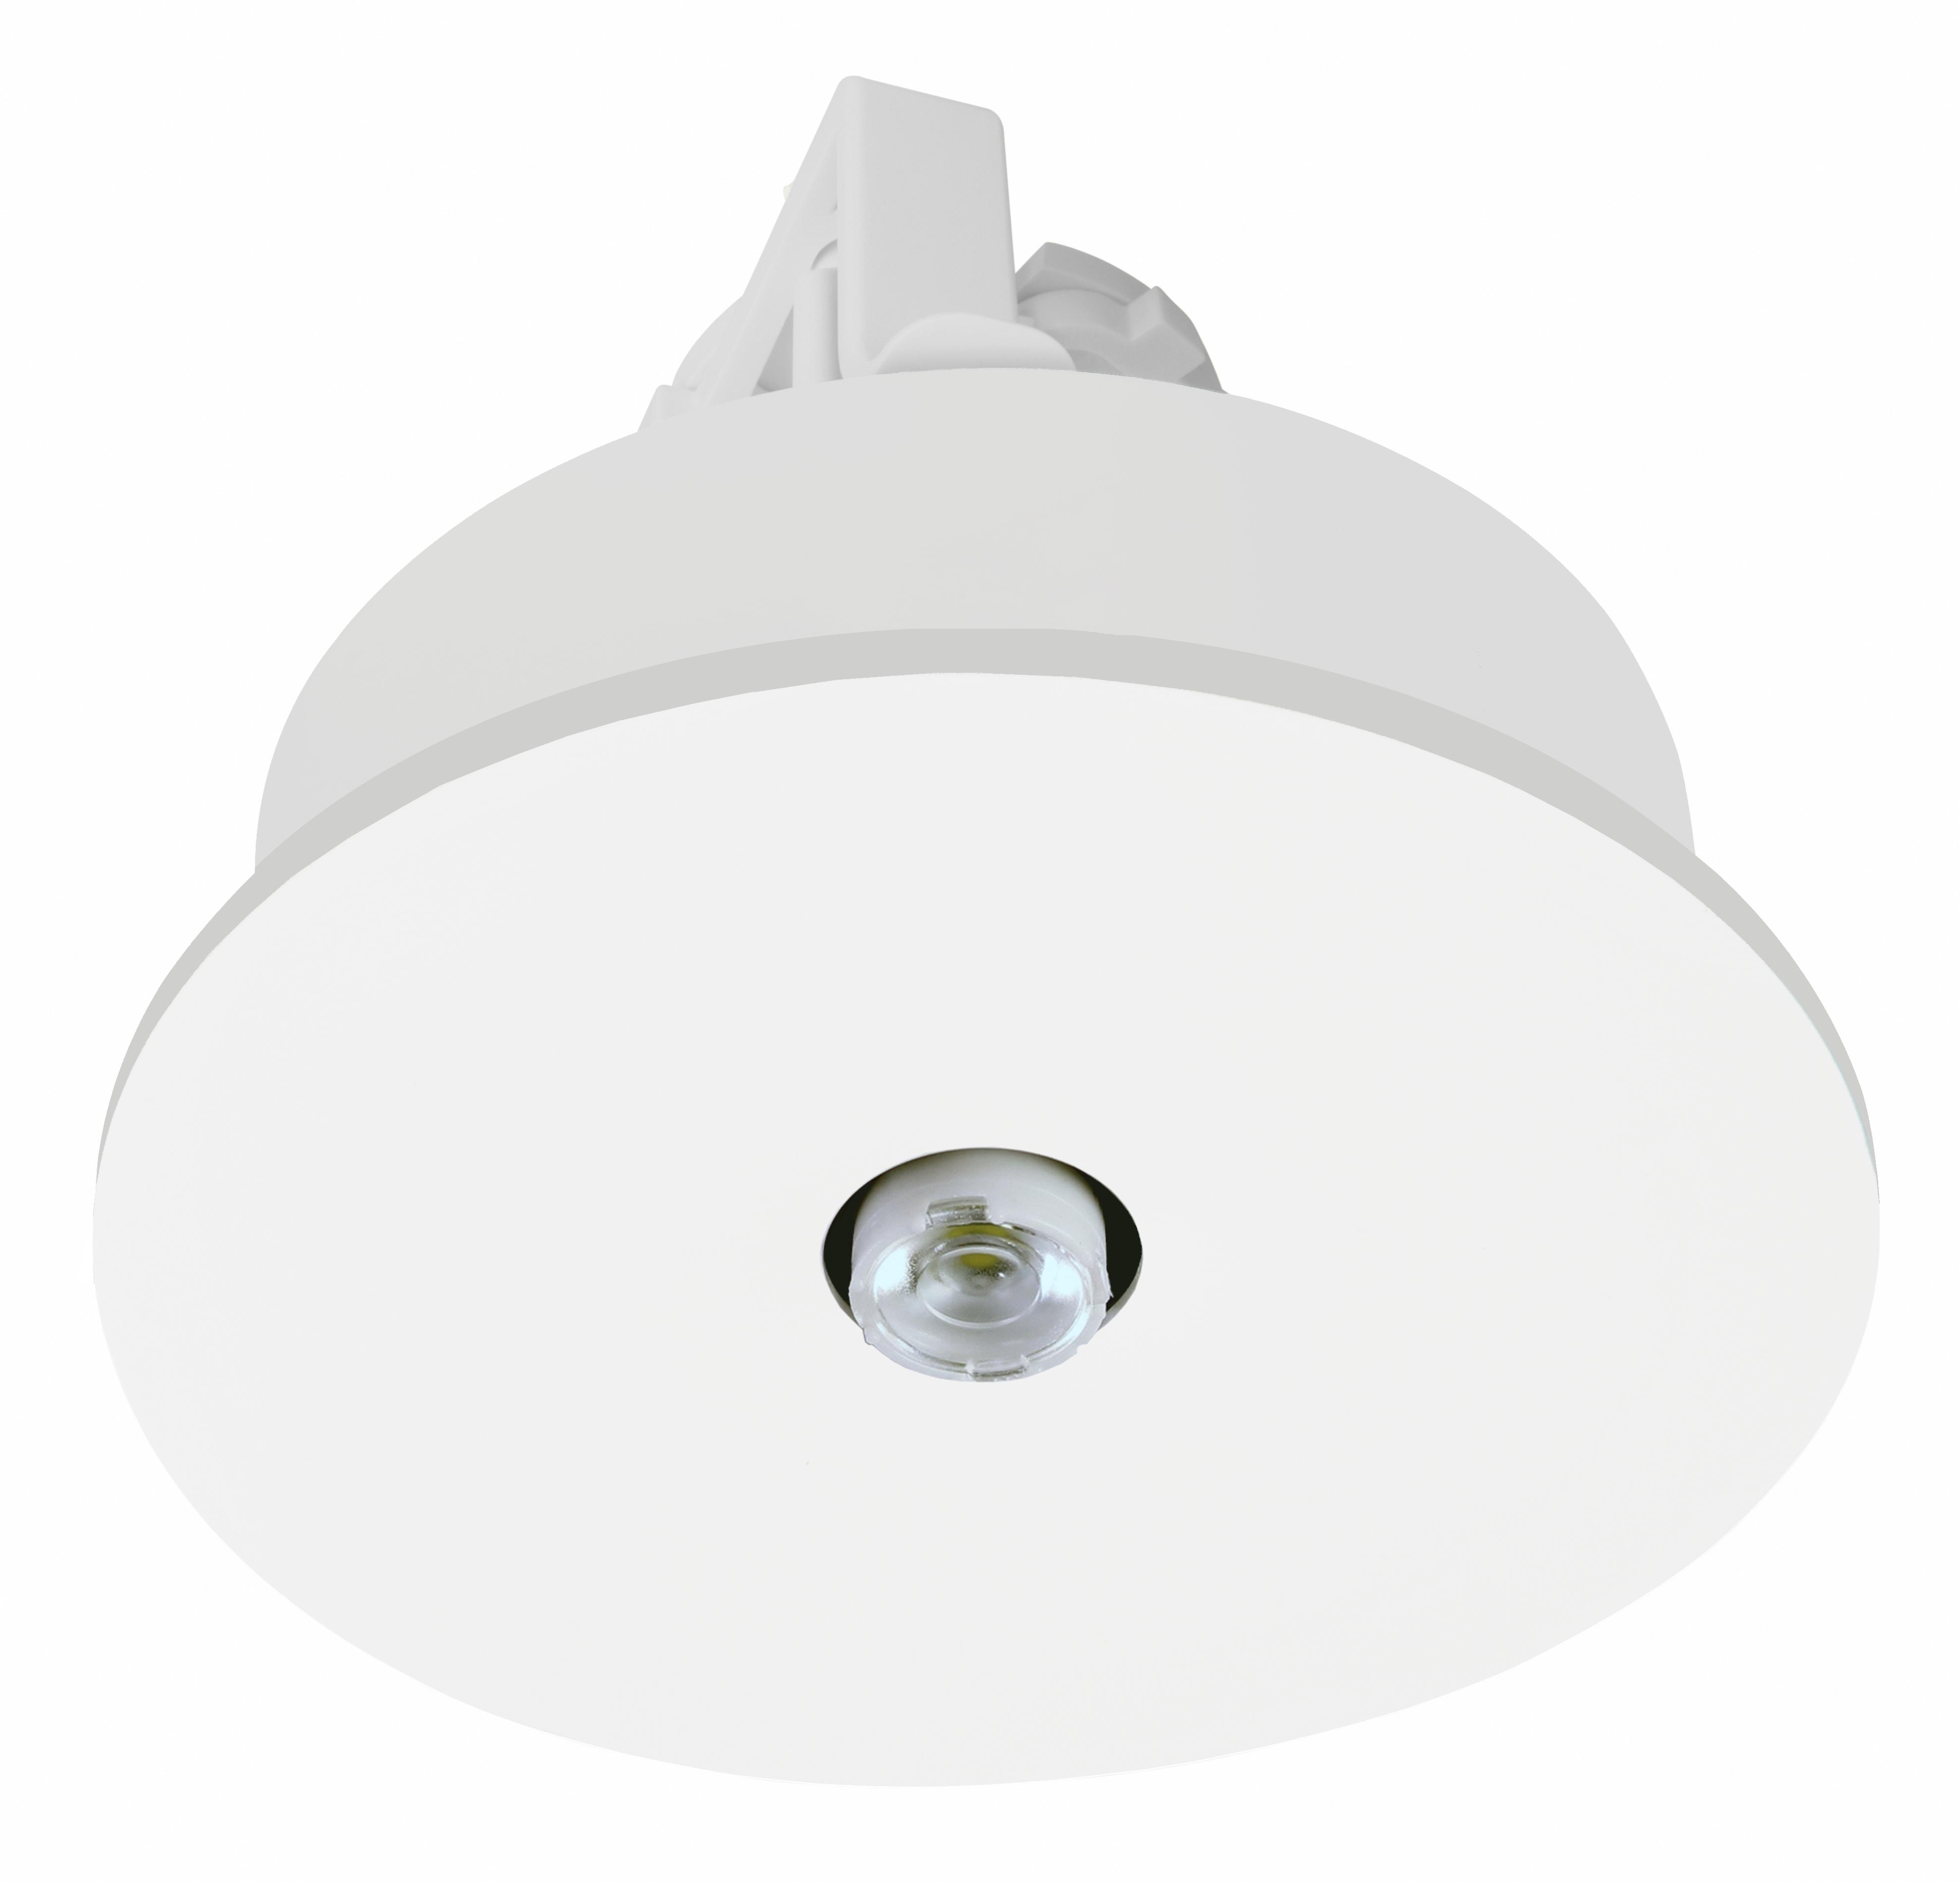 1 Stk Notleuchte IL  ERT-LED 1x3W 230V Spot Einbaumontage NLILES029M